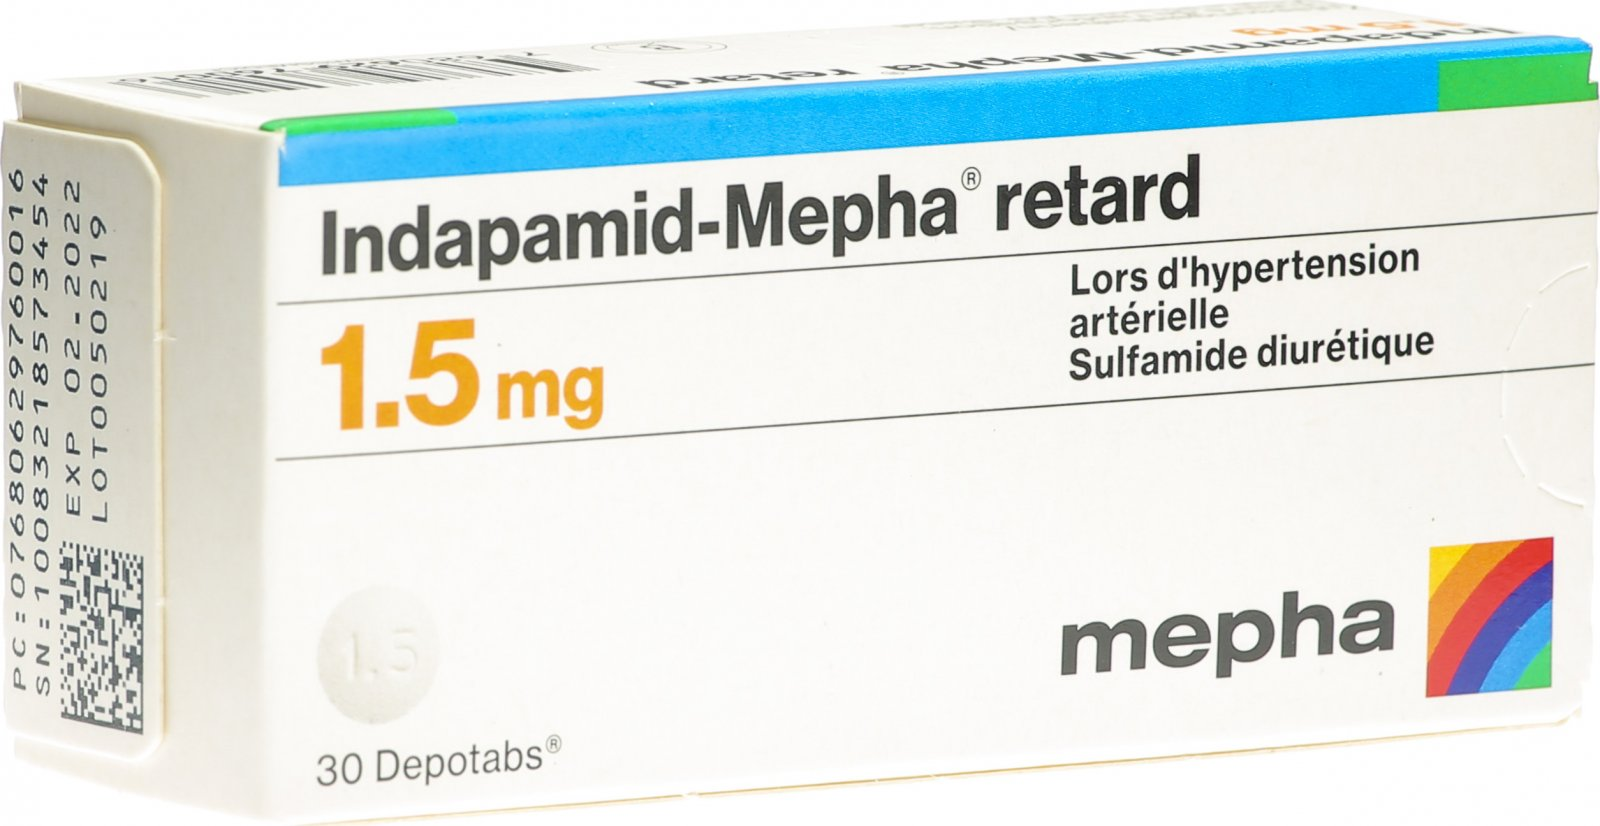 Indapamid Mepha Retard Depotabs 20.20mg 20 Stück in der Adler Apotheke